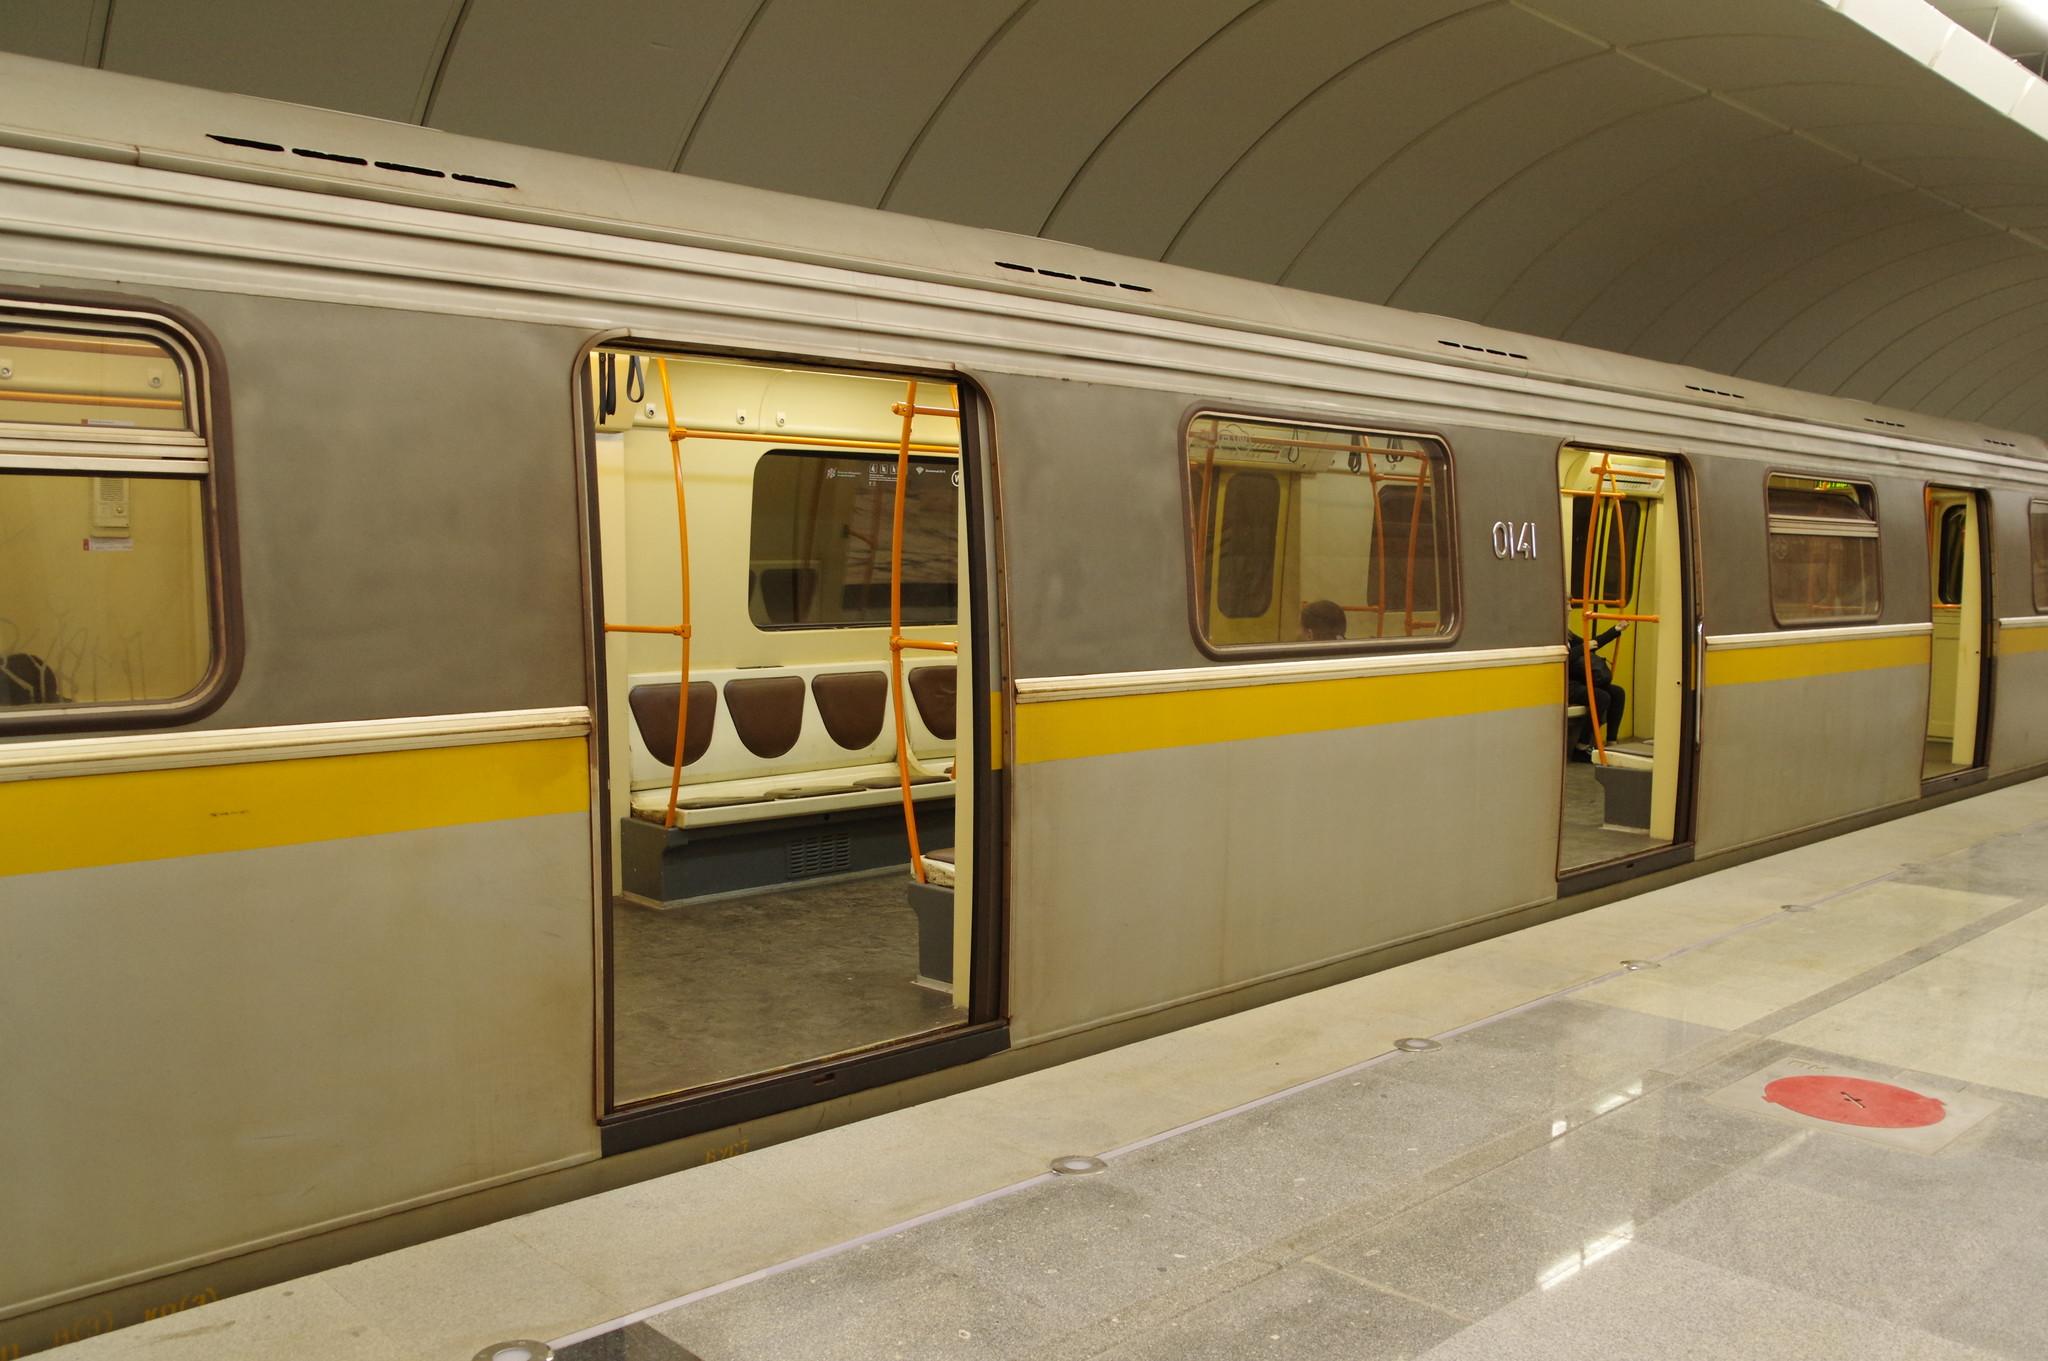 Вагоны модели 81-721.1 «Яуза» № 0141 Московского метрополитена на Люблинско-Дмитровской линии